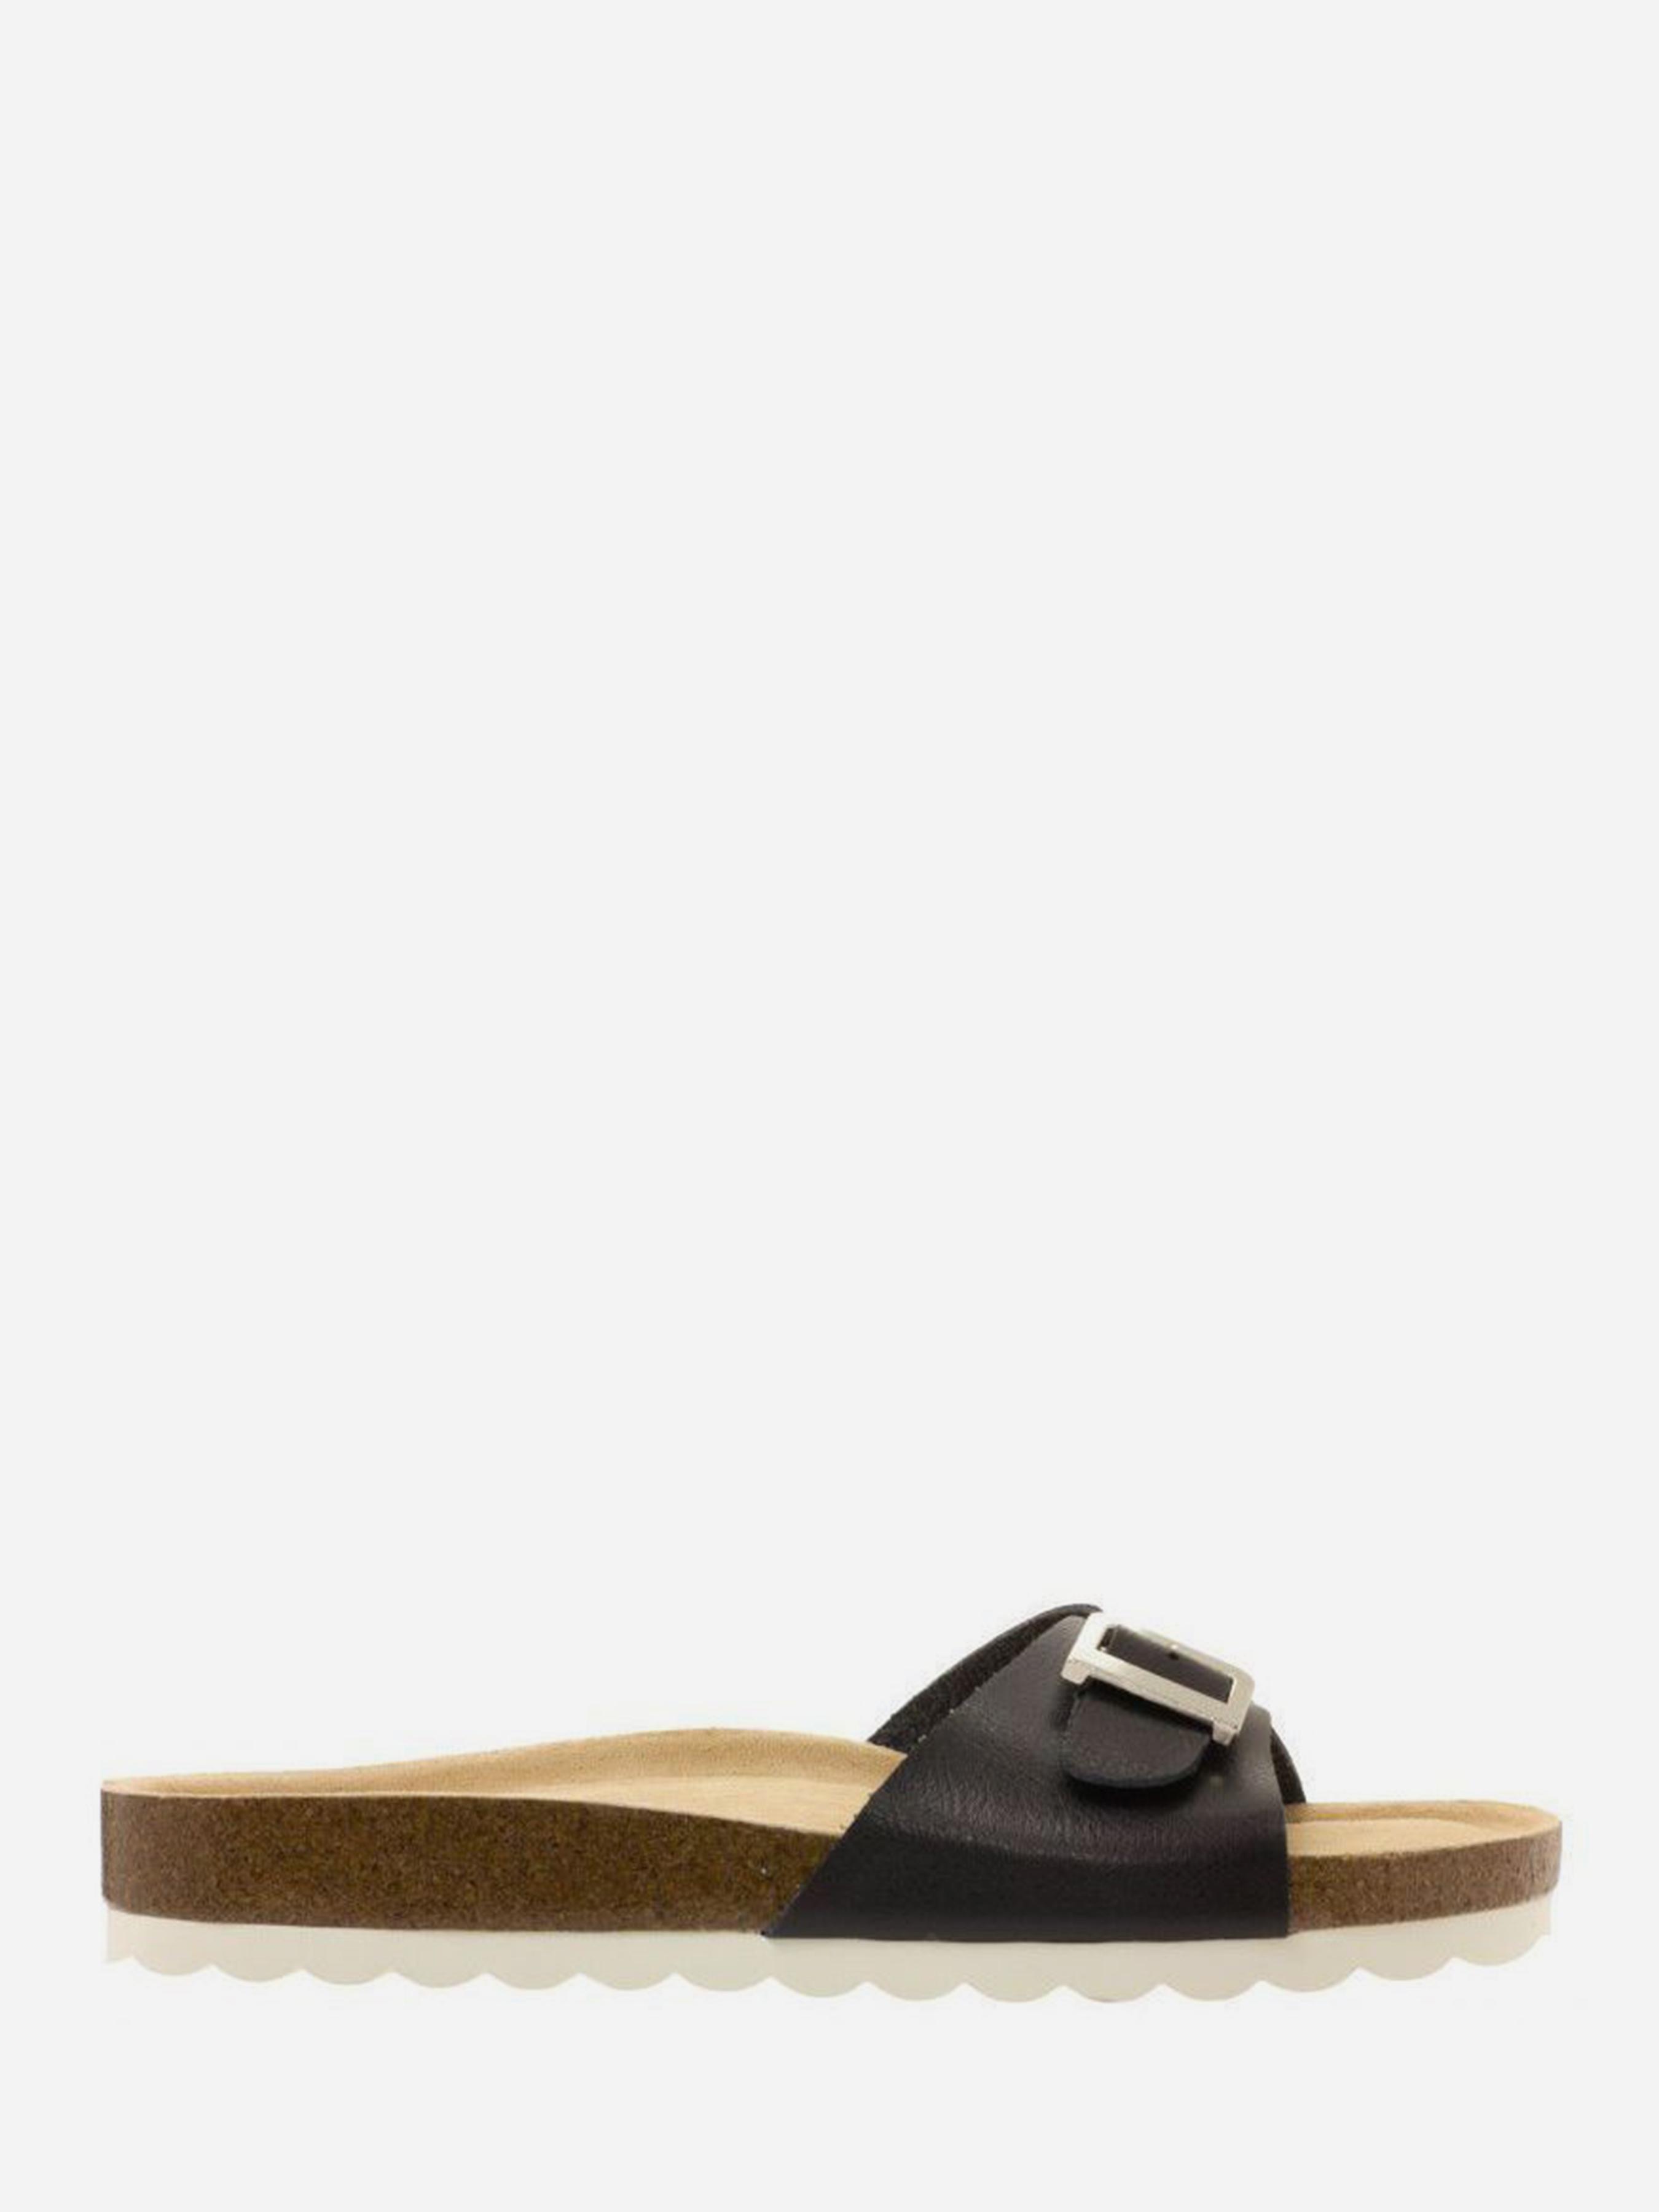 Шлёпанцы для женщин Skechers KW4002 размеры обуви, 2017